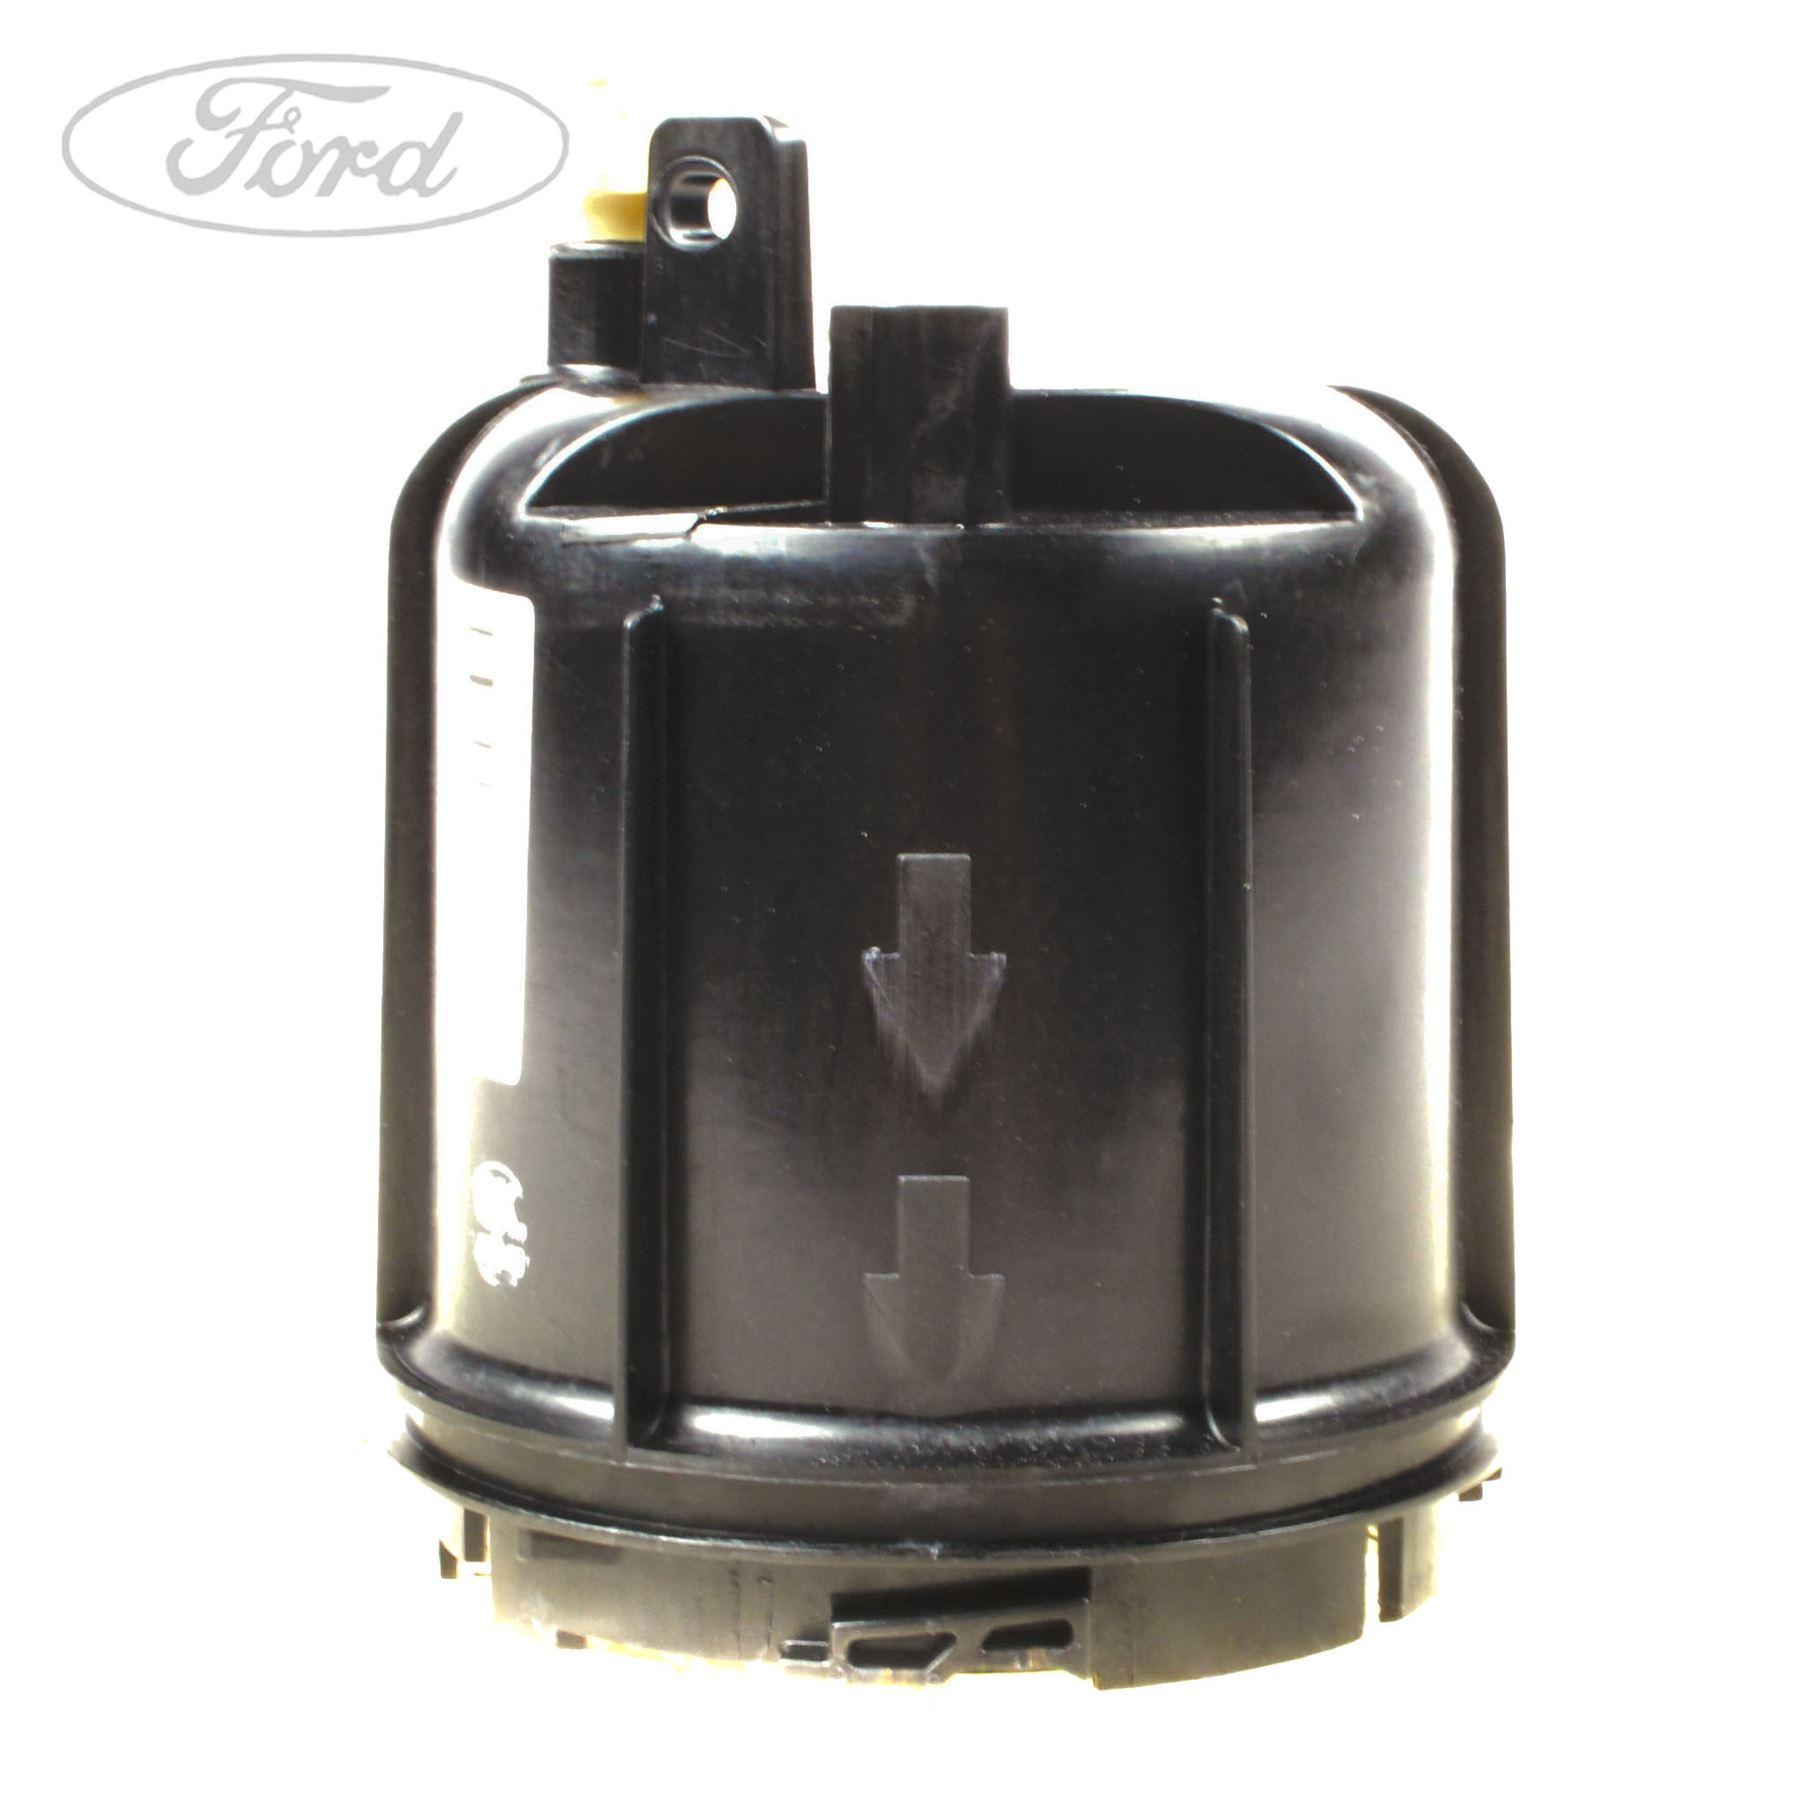 Genuine Ford Transit MK8 Tourneo 2.2 TDCi Diesel Fuel Filter Housing 1781617